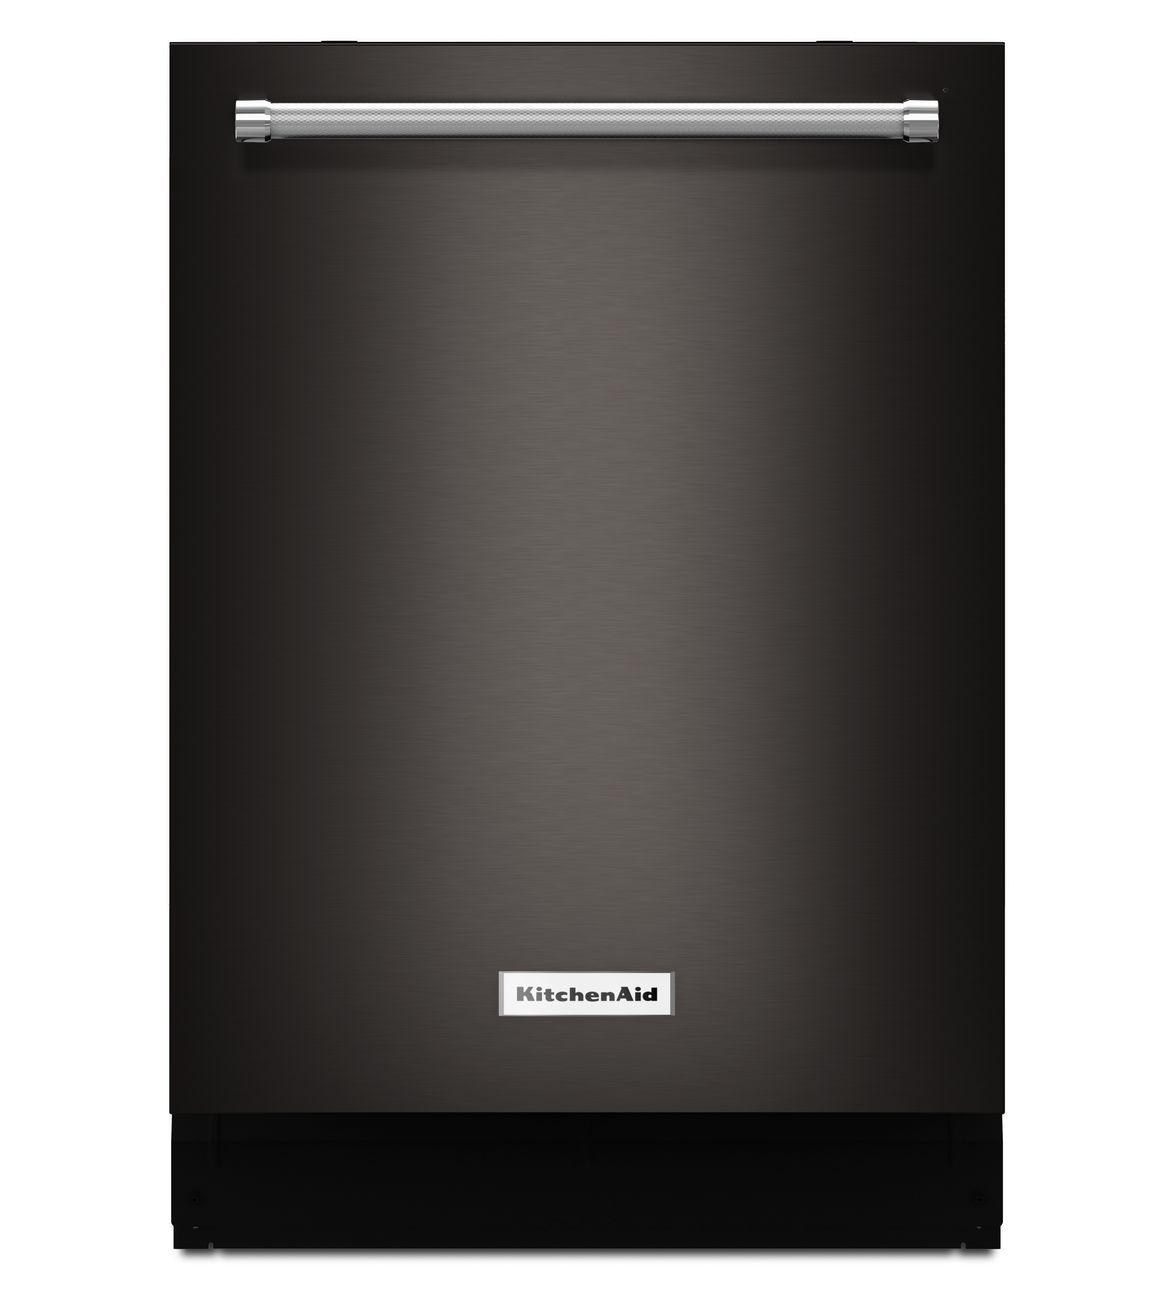 kitchenaid-dishwasher